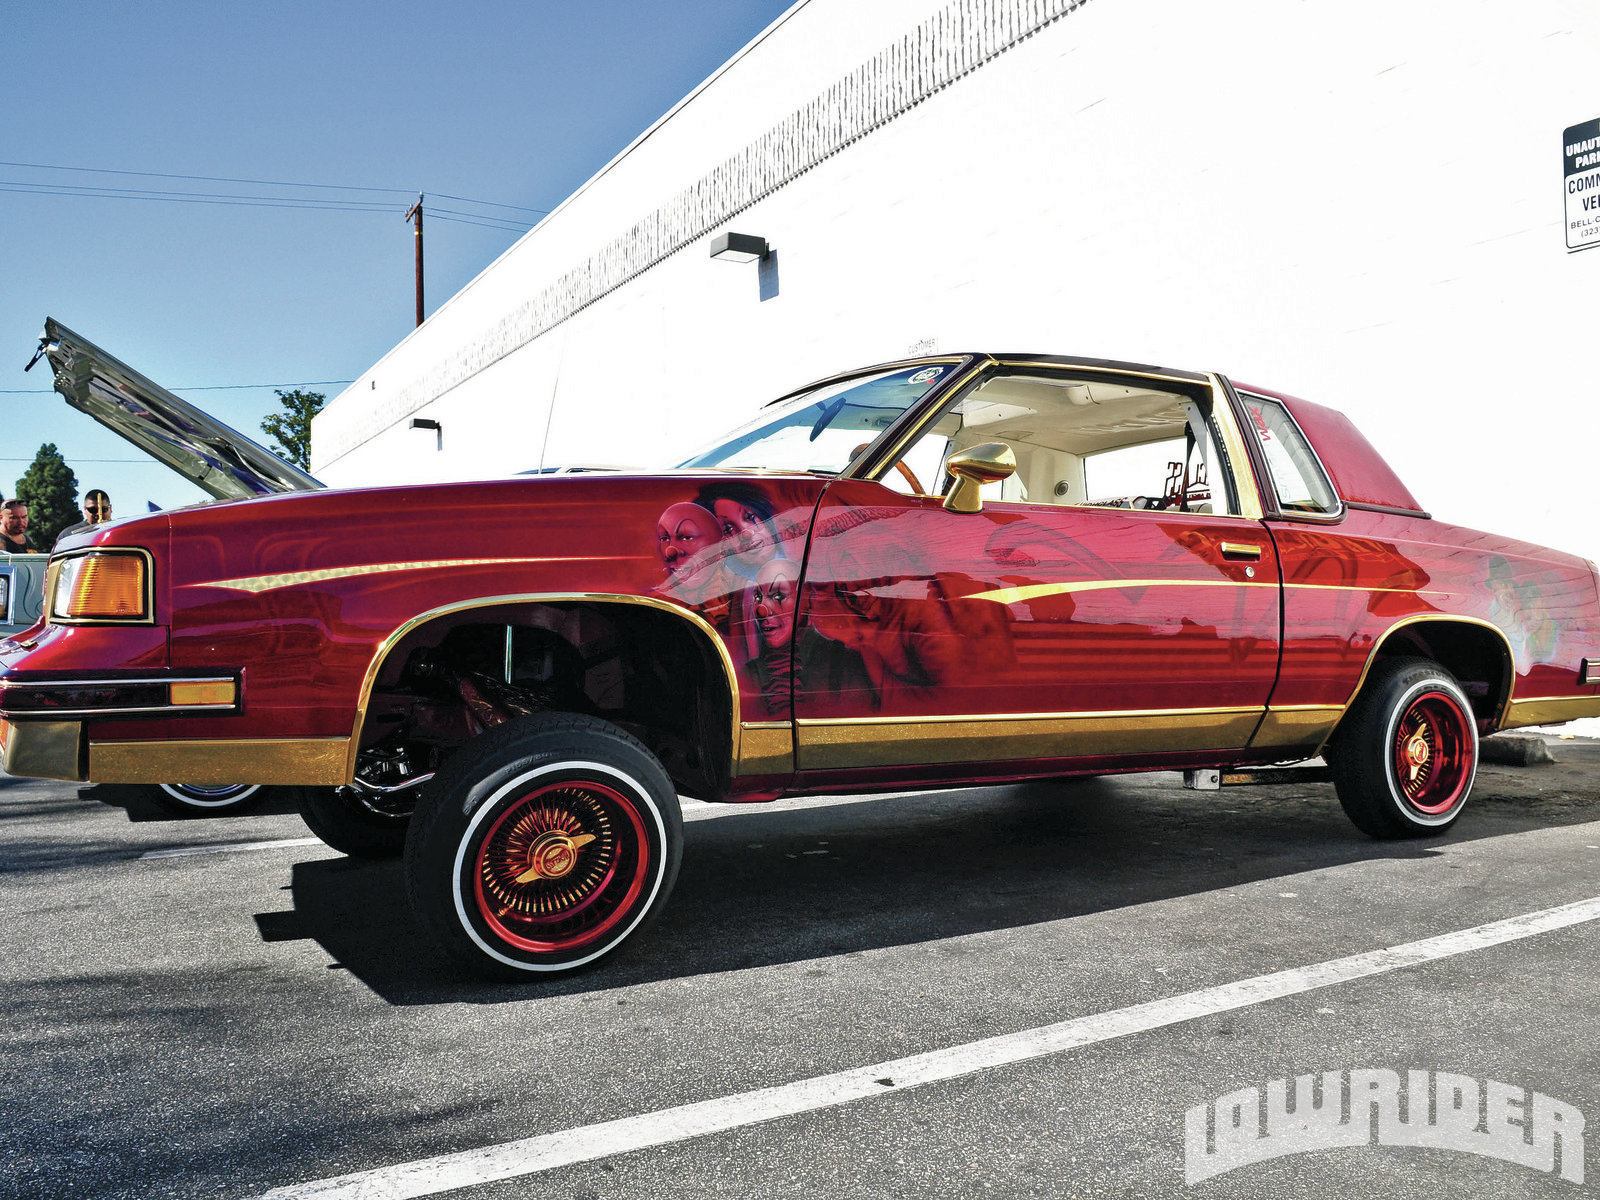 Maniacos Car Club Toy Drive - Bell, California - Lowrider ...